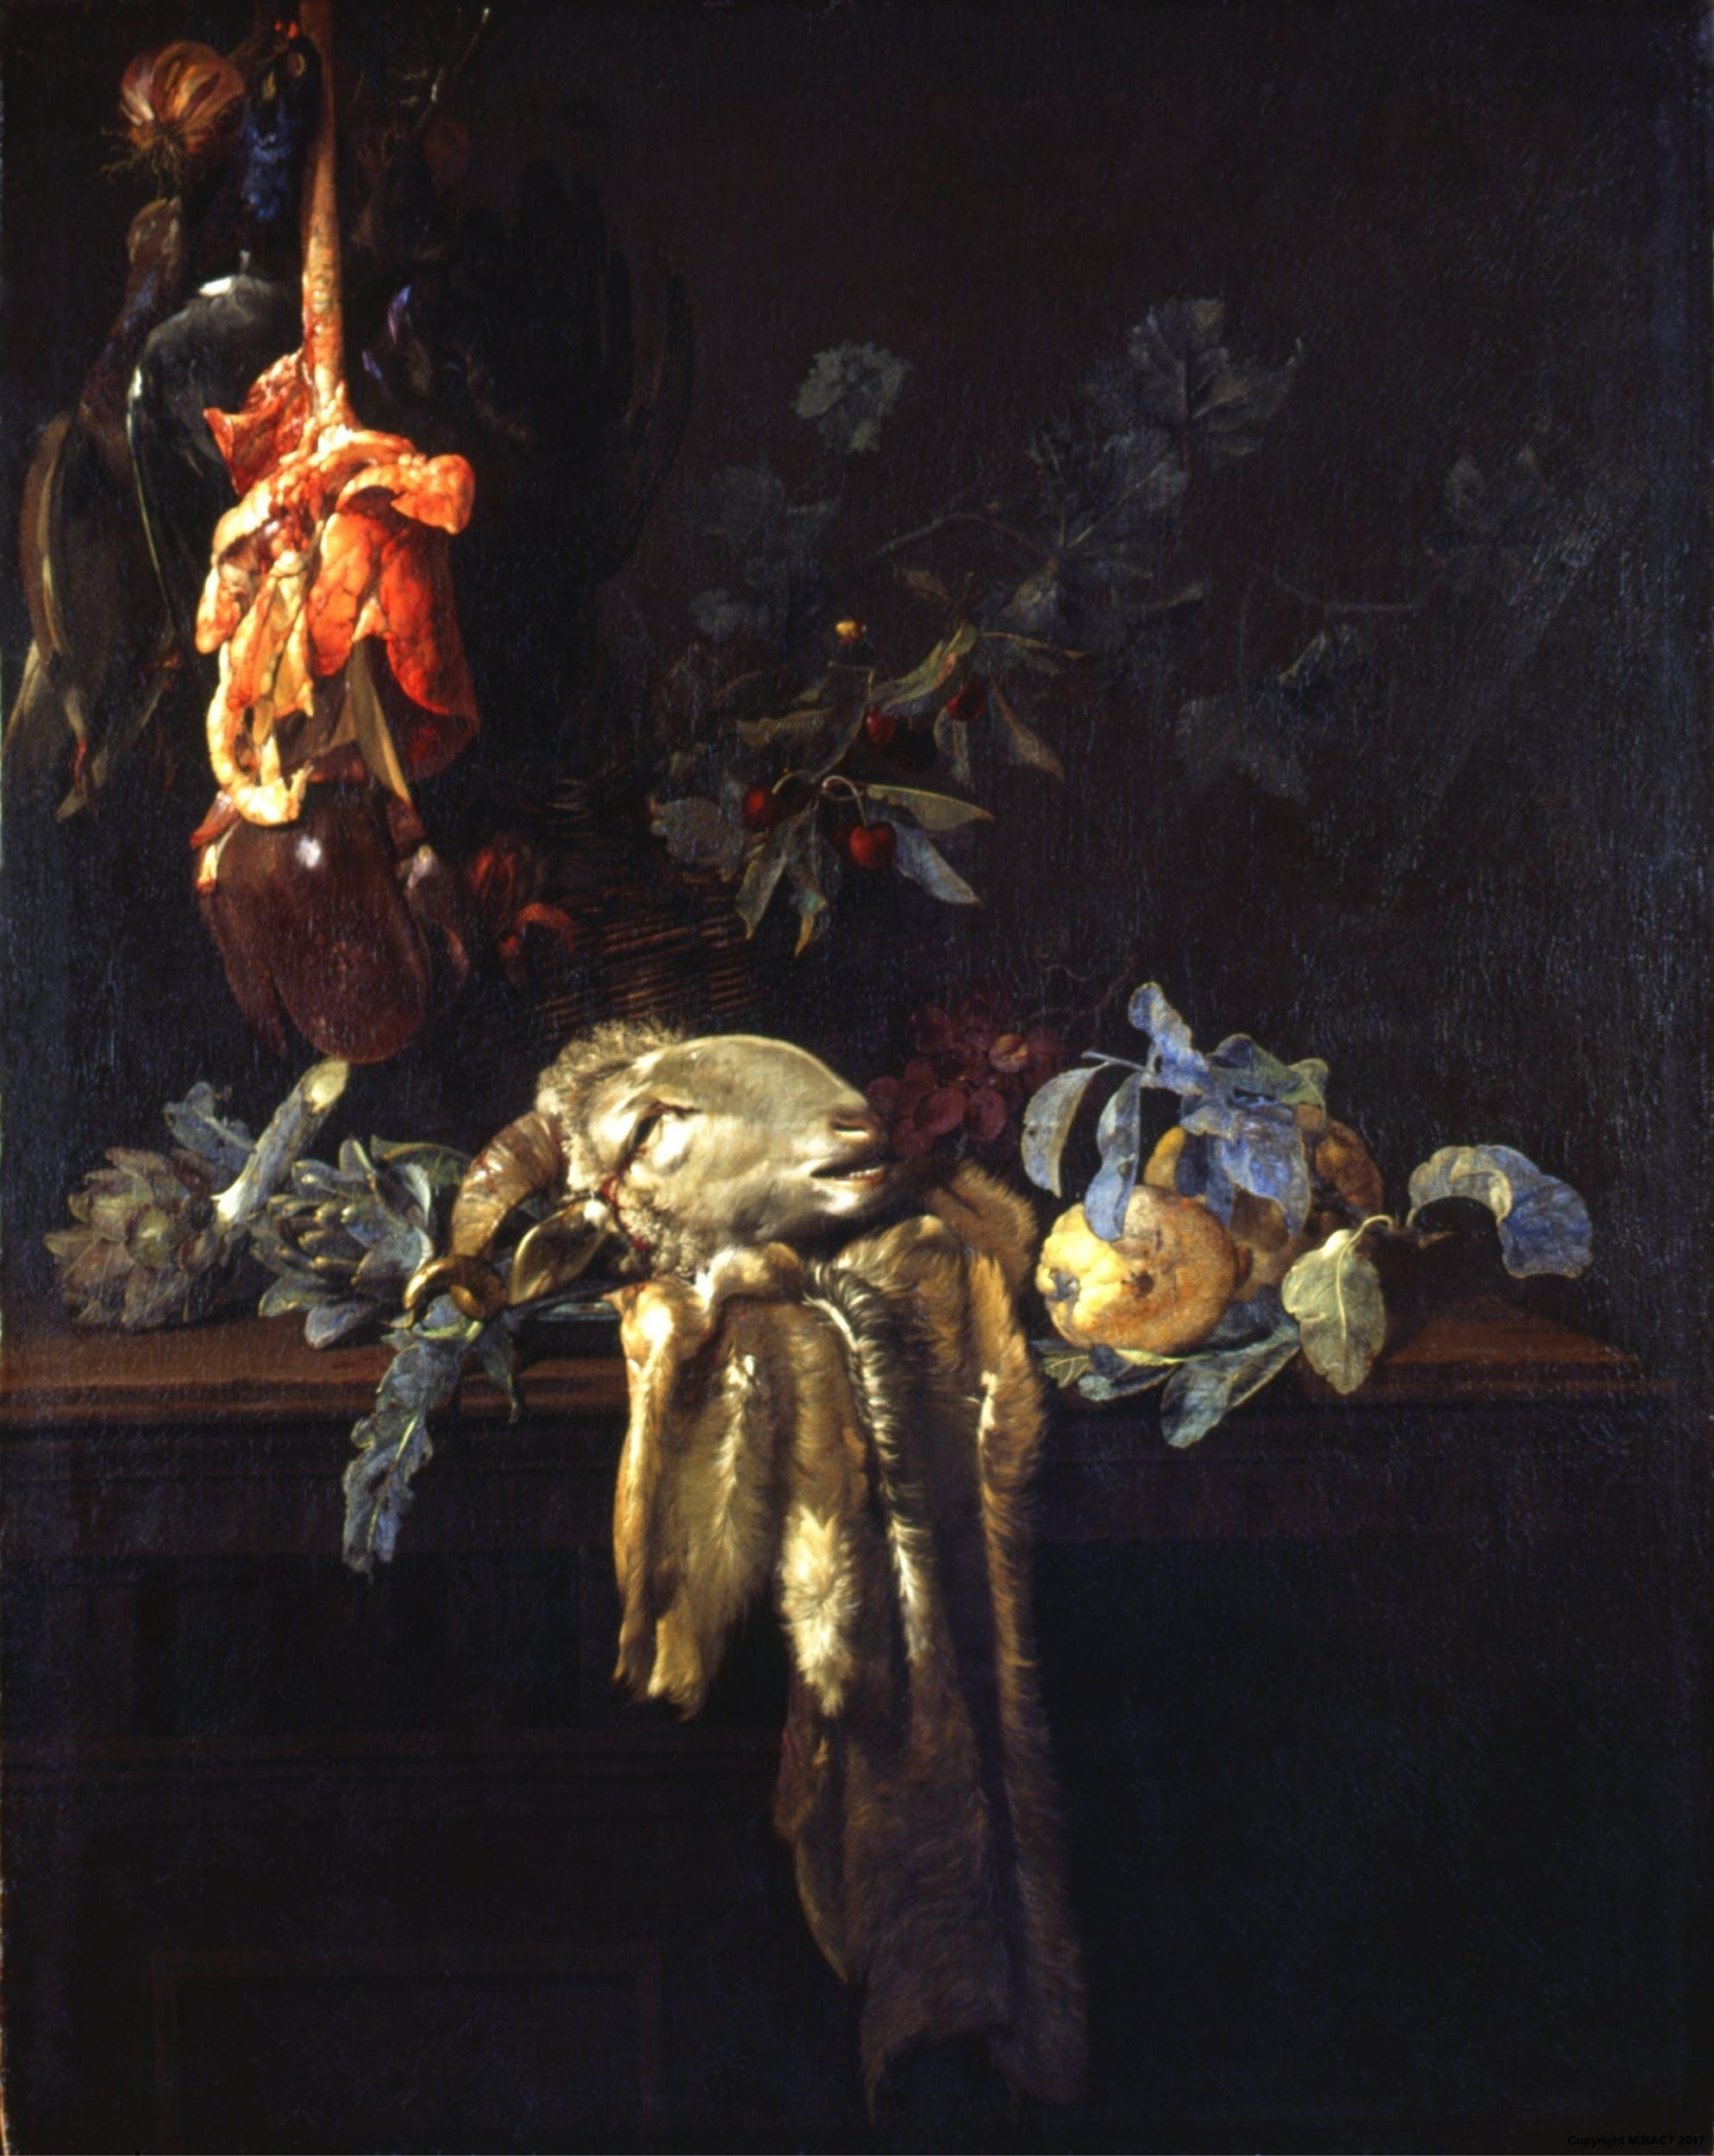 Pitture Murali Giovan Carlo Dei Medici  semarang 2021